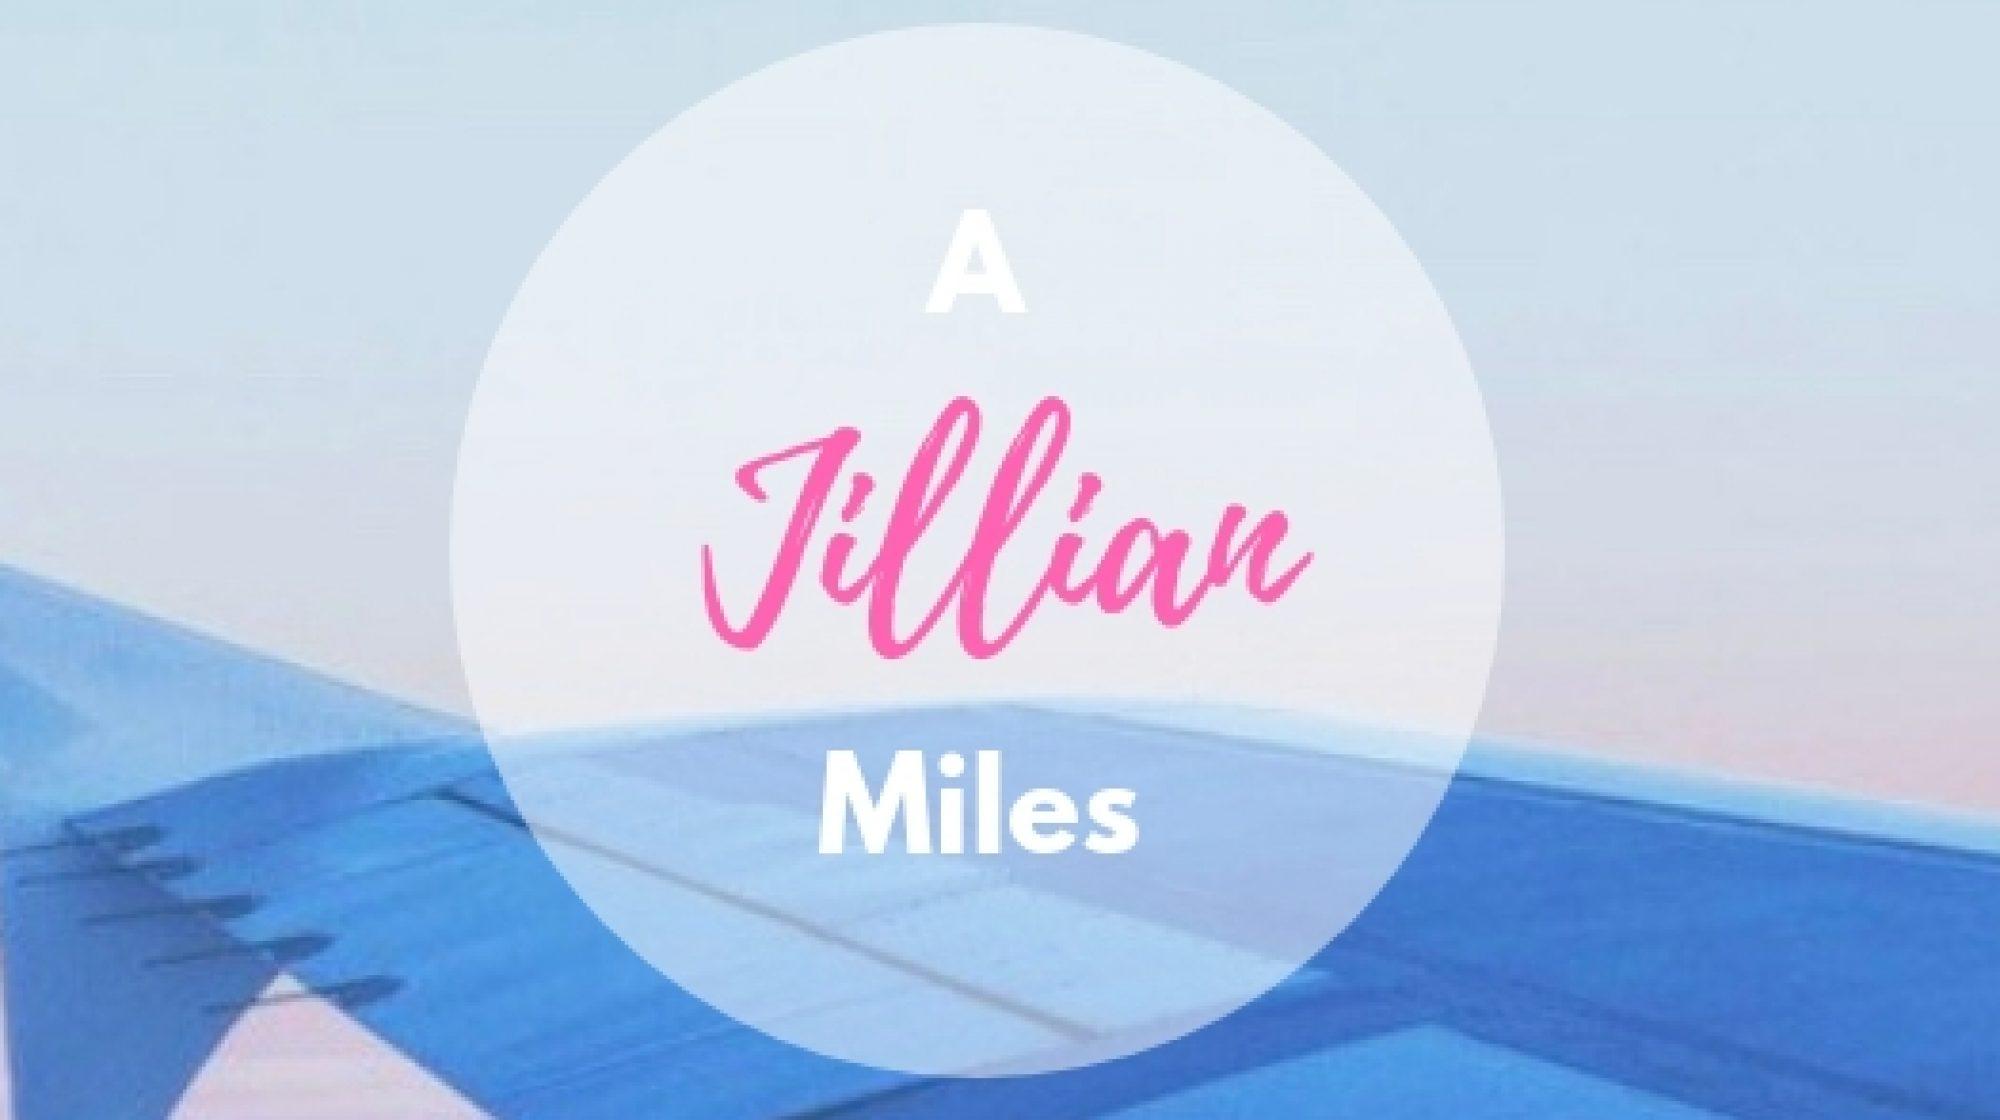 A jillian Miles